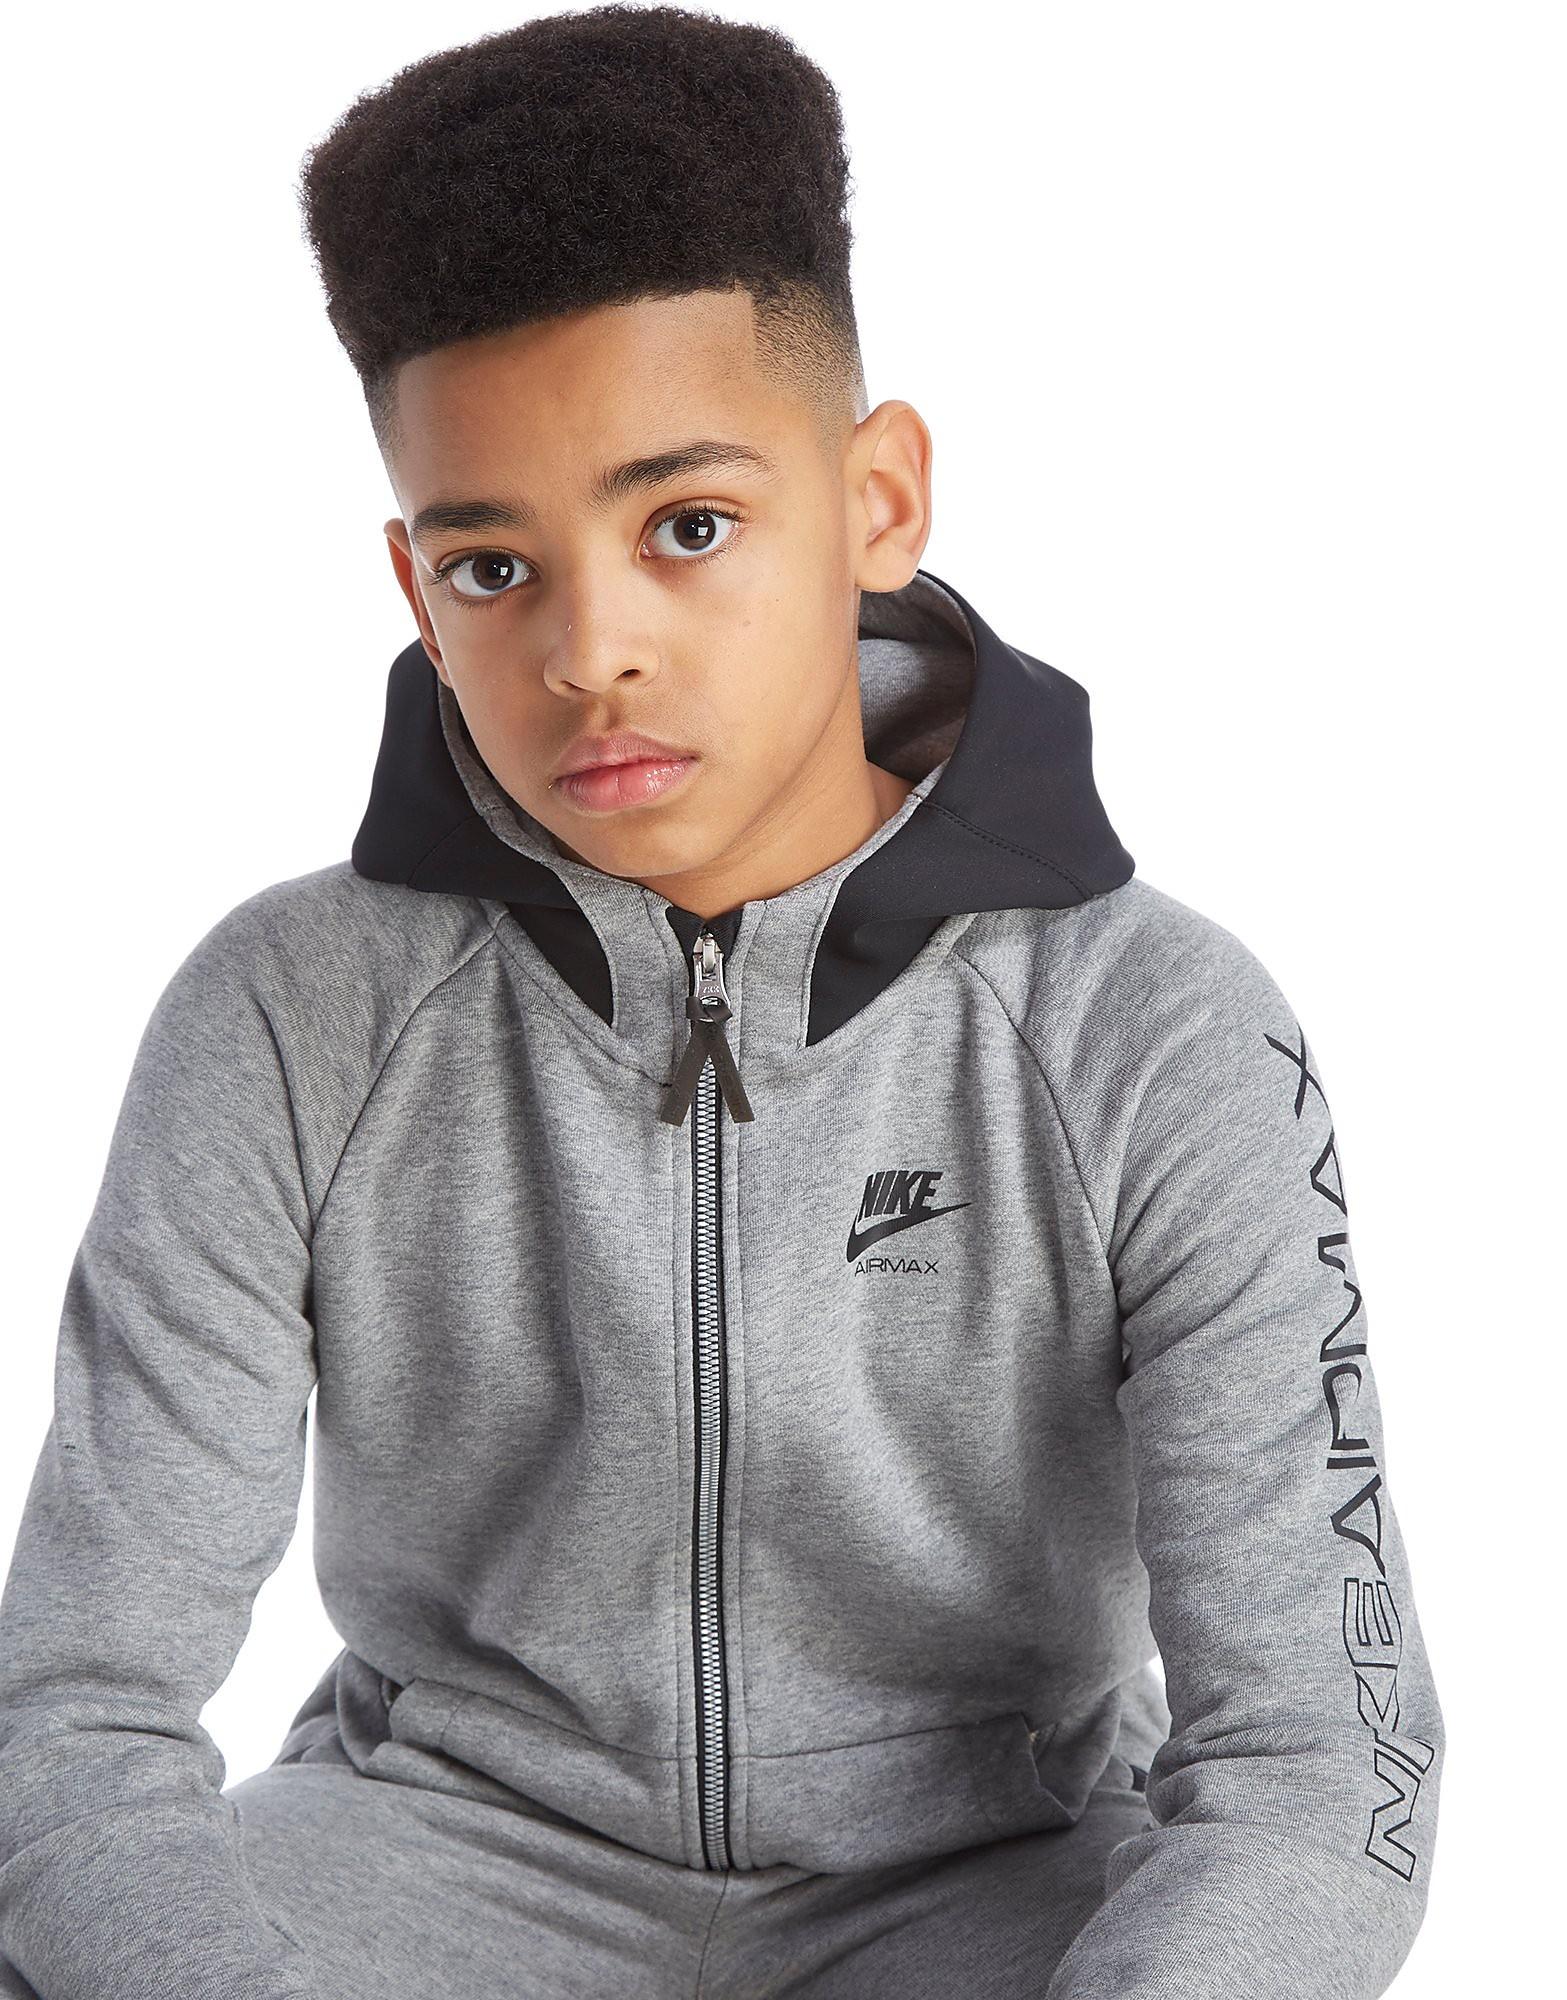 Nike Air Max Voller Reißverschluss Kapuzenpullover Junior